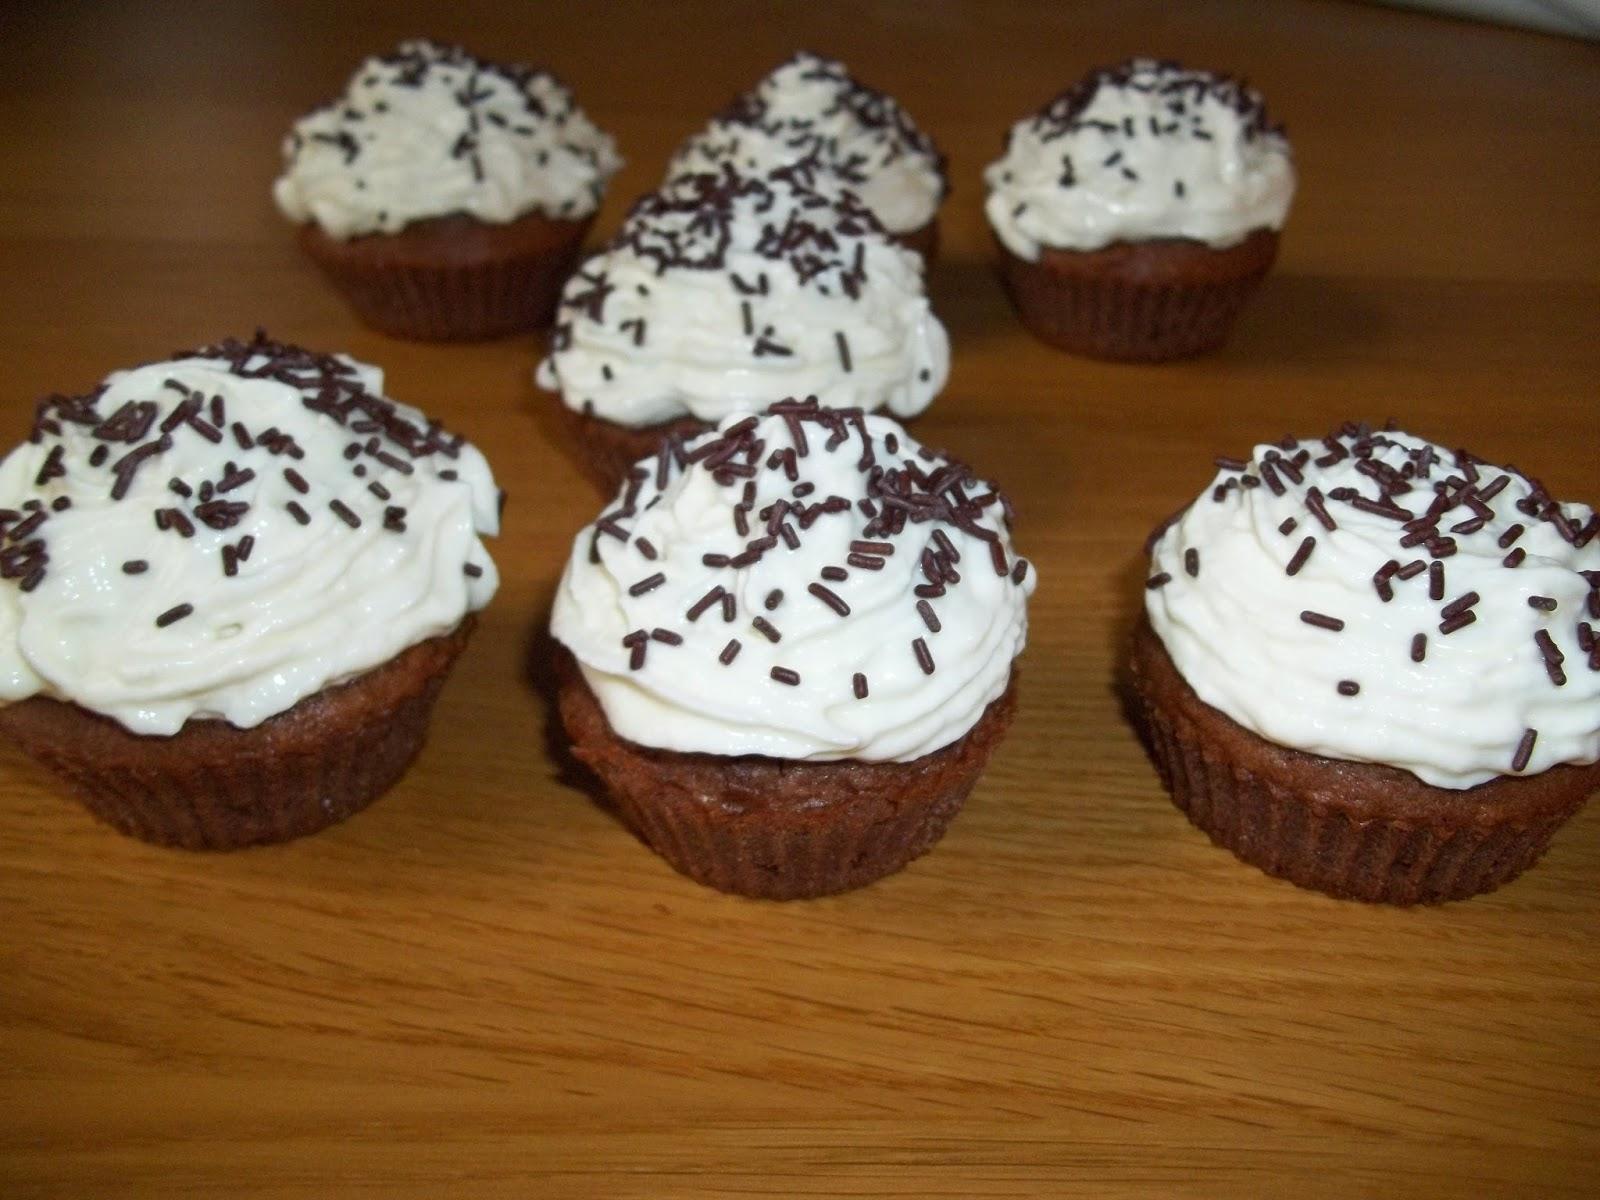 http://cuisinezcommeceline.blogspot.fr/2015/01/cupcakes-chocococo.html